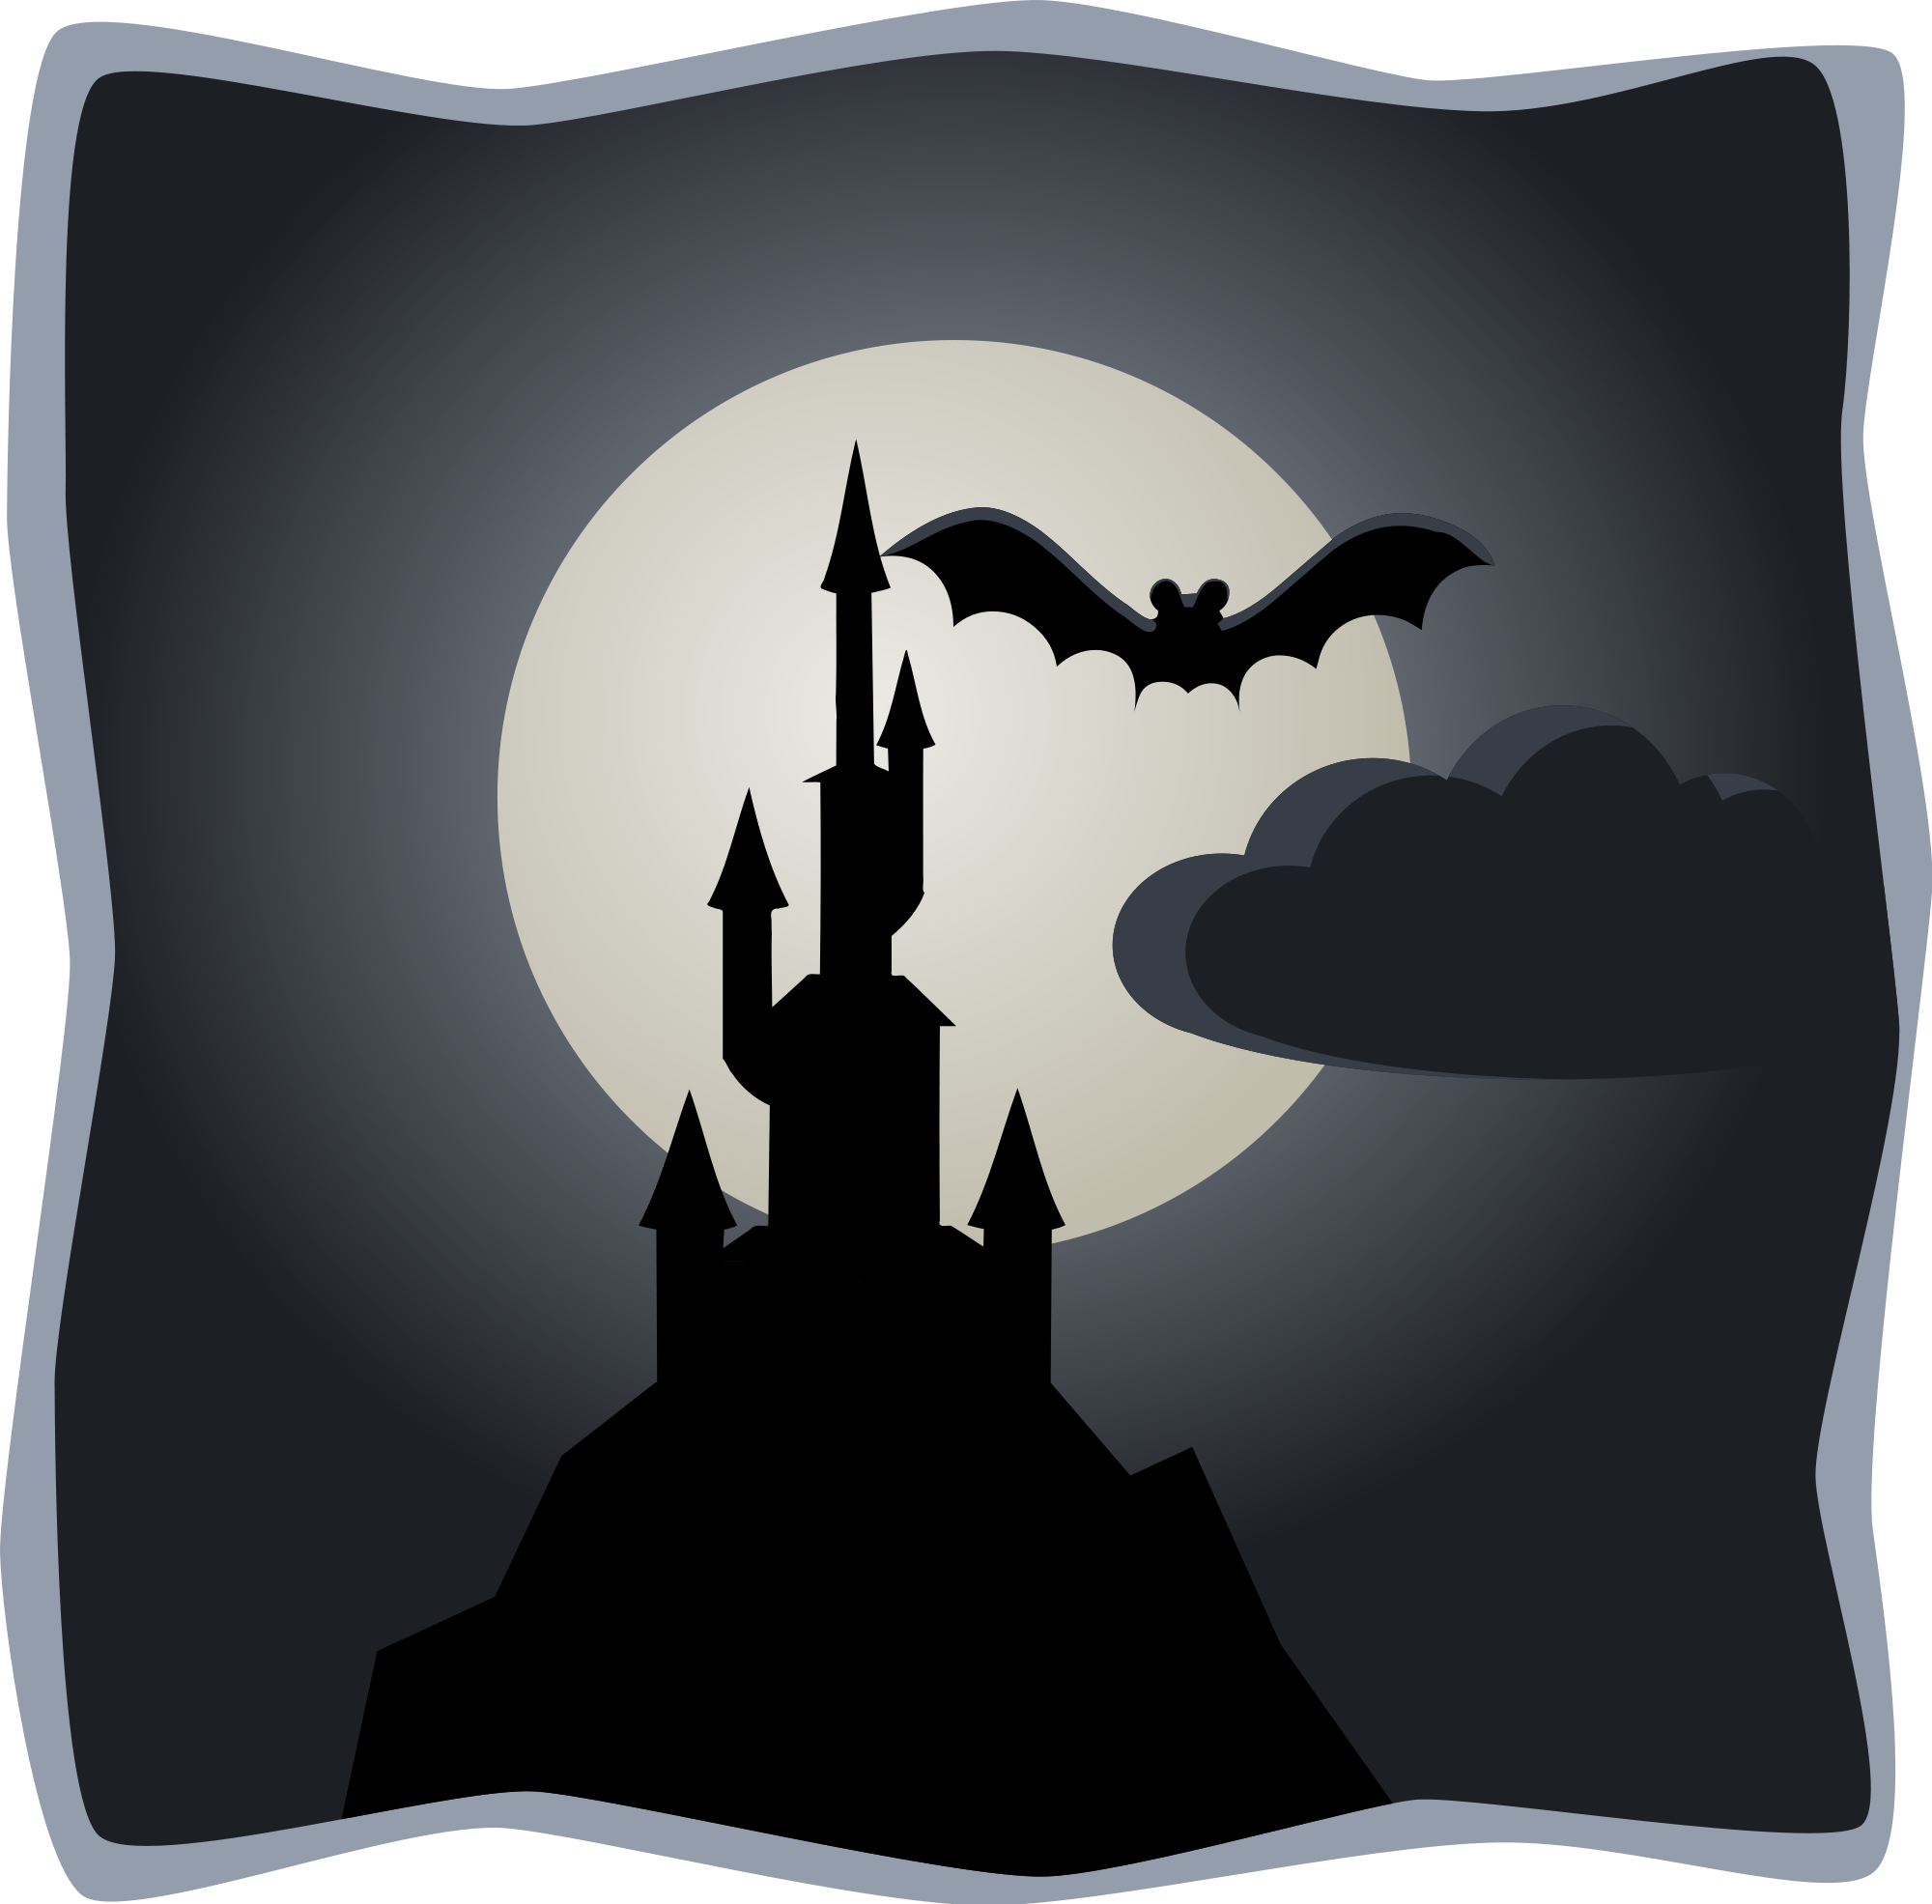 Pillow clipart svg. File spooky castle in